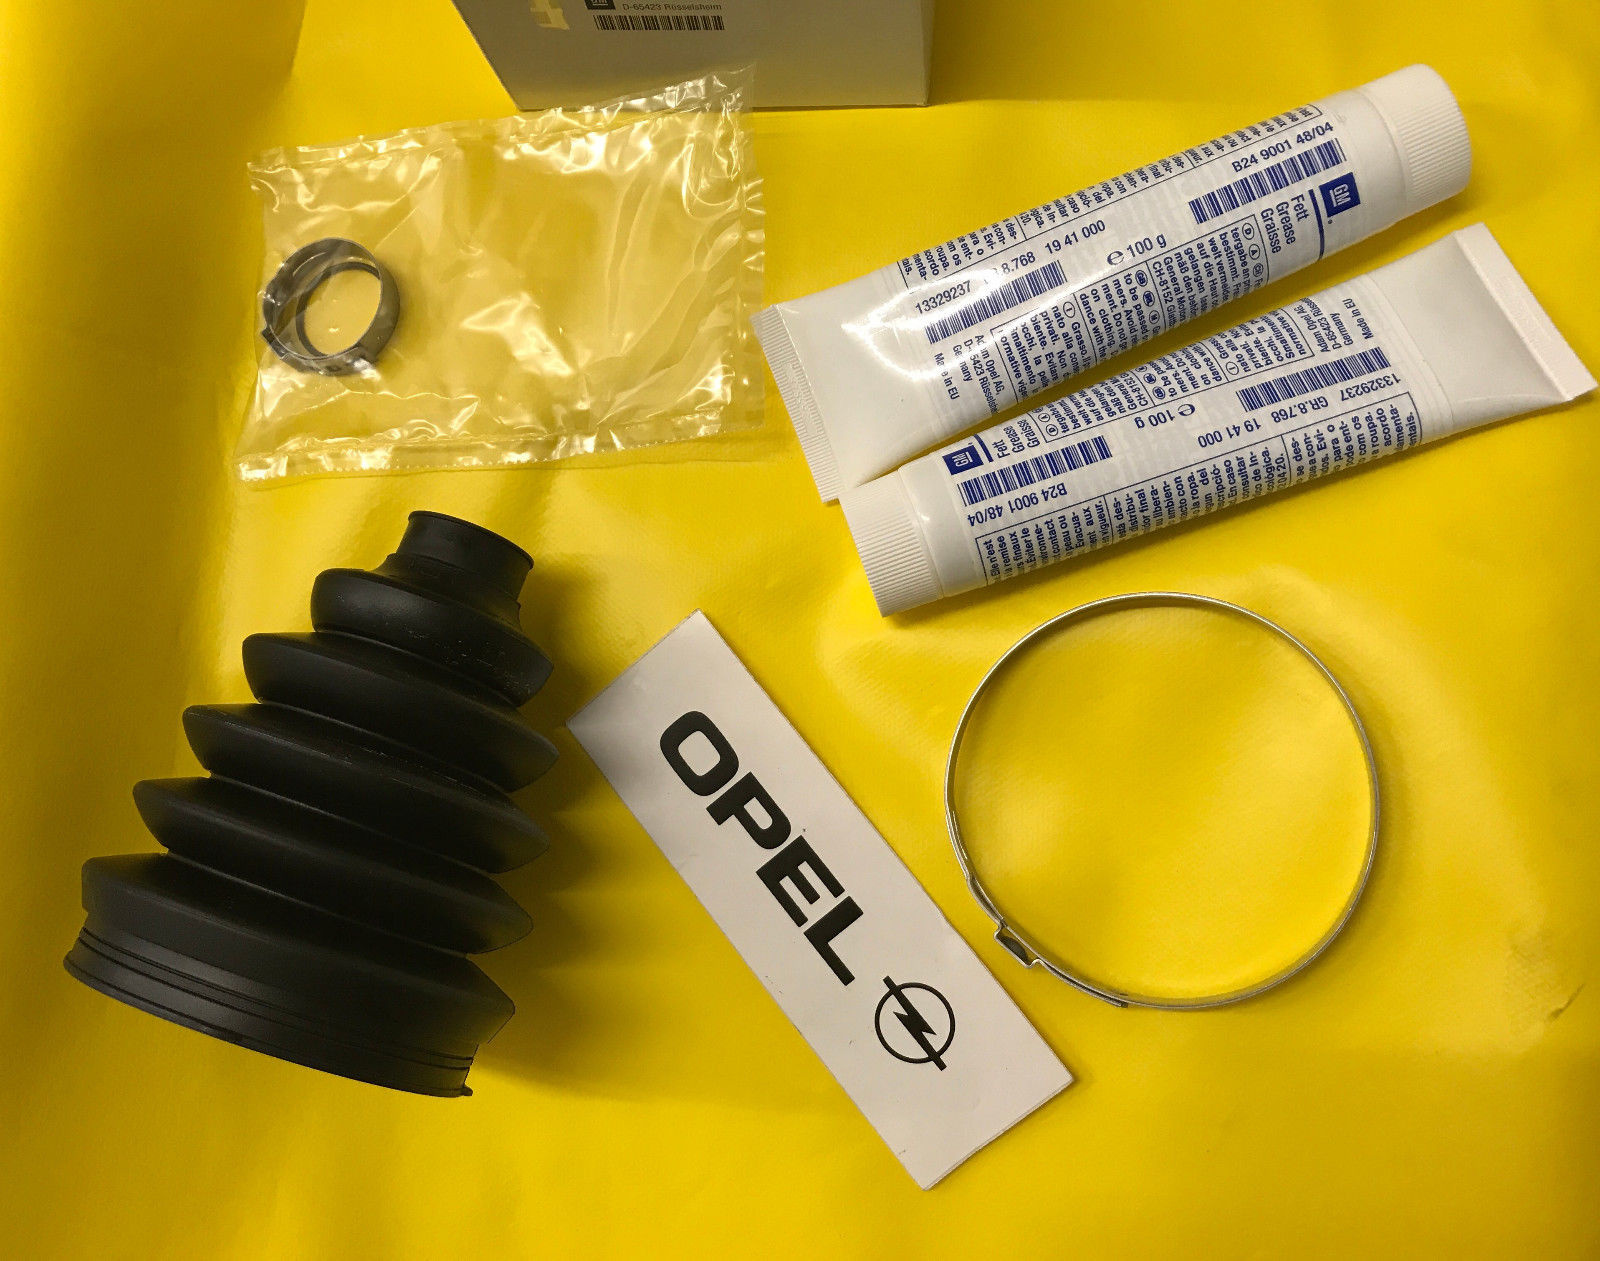 Antriebswelle für Opel Astra H Zafira B 1.9 CDTI 150PS links